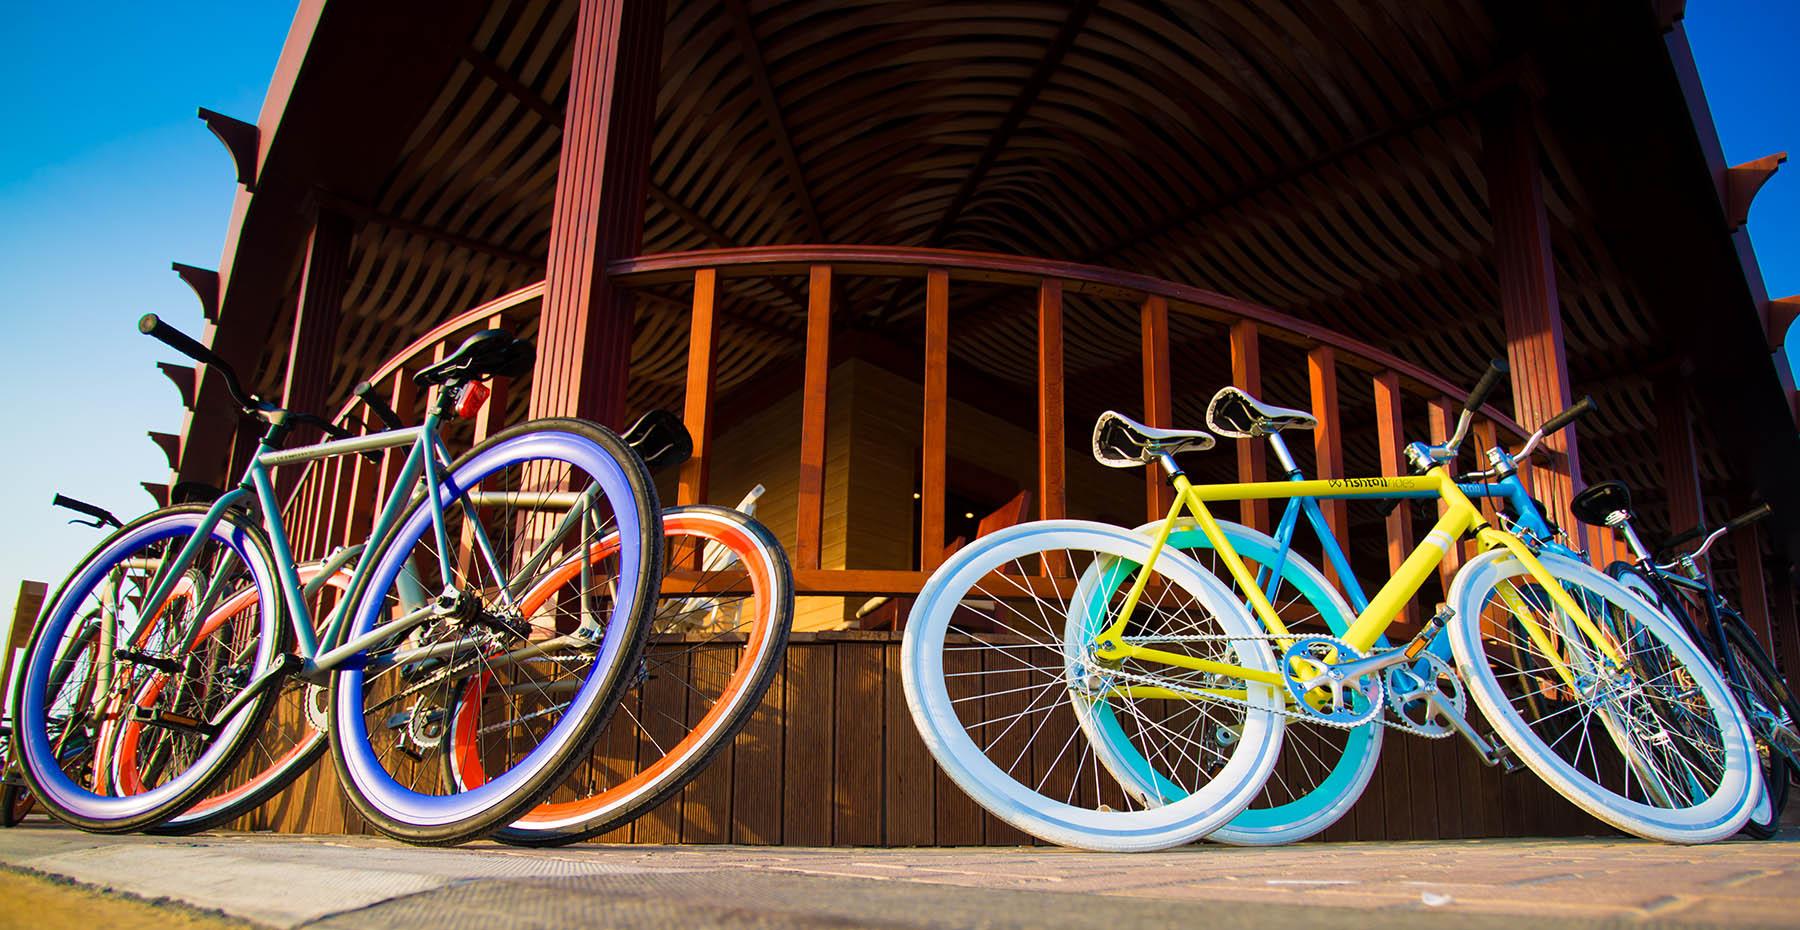 Fishtail ride bikes at the PUMA event by Loesje Kessels Fashion Photographer Dubai